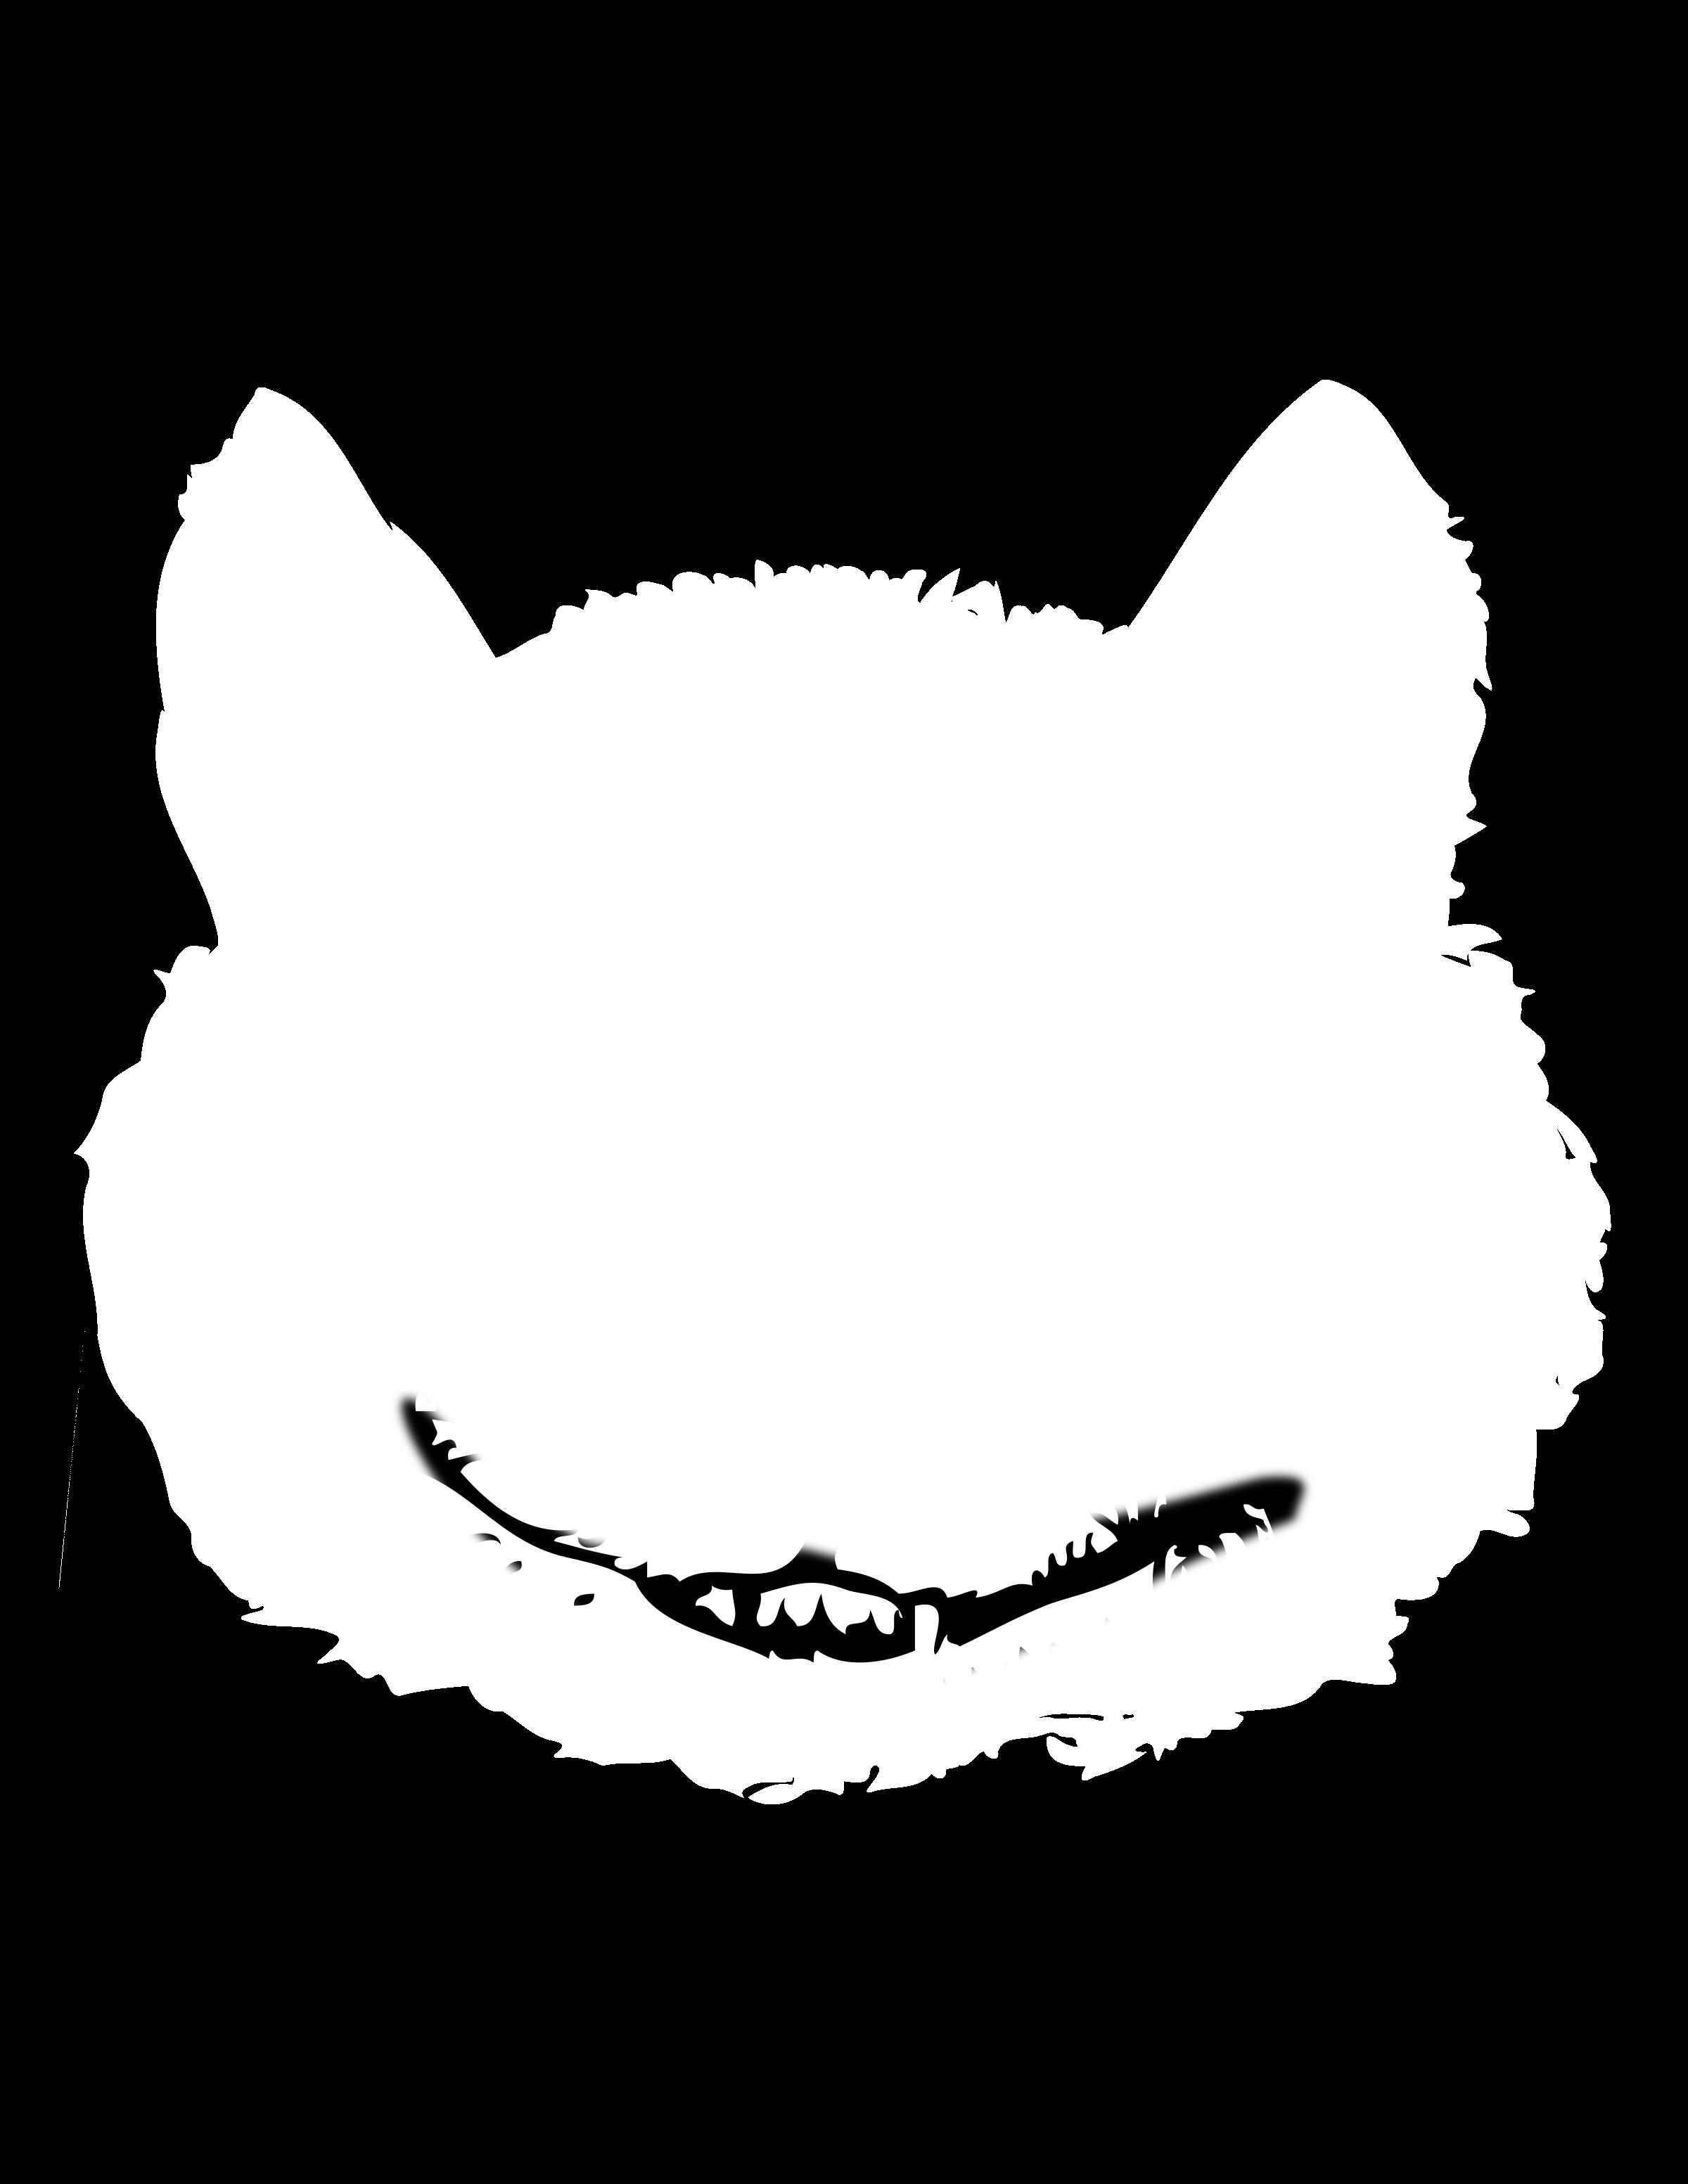 Animated cheshire big image. Clipart smile alice in wonderland cat